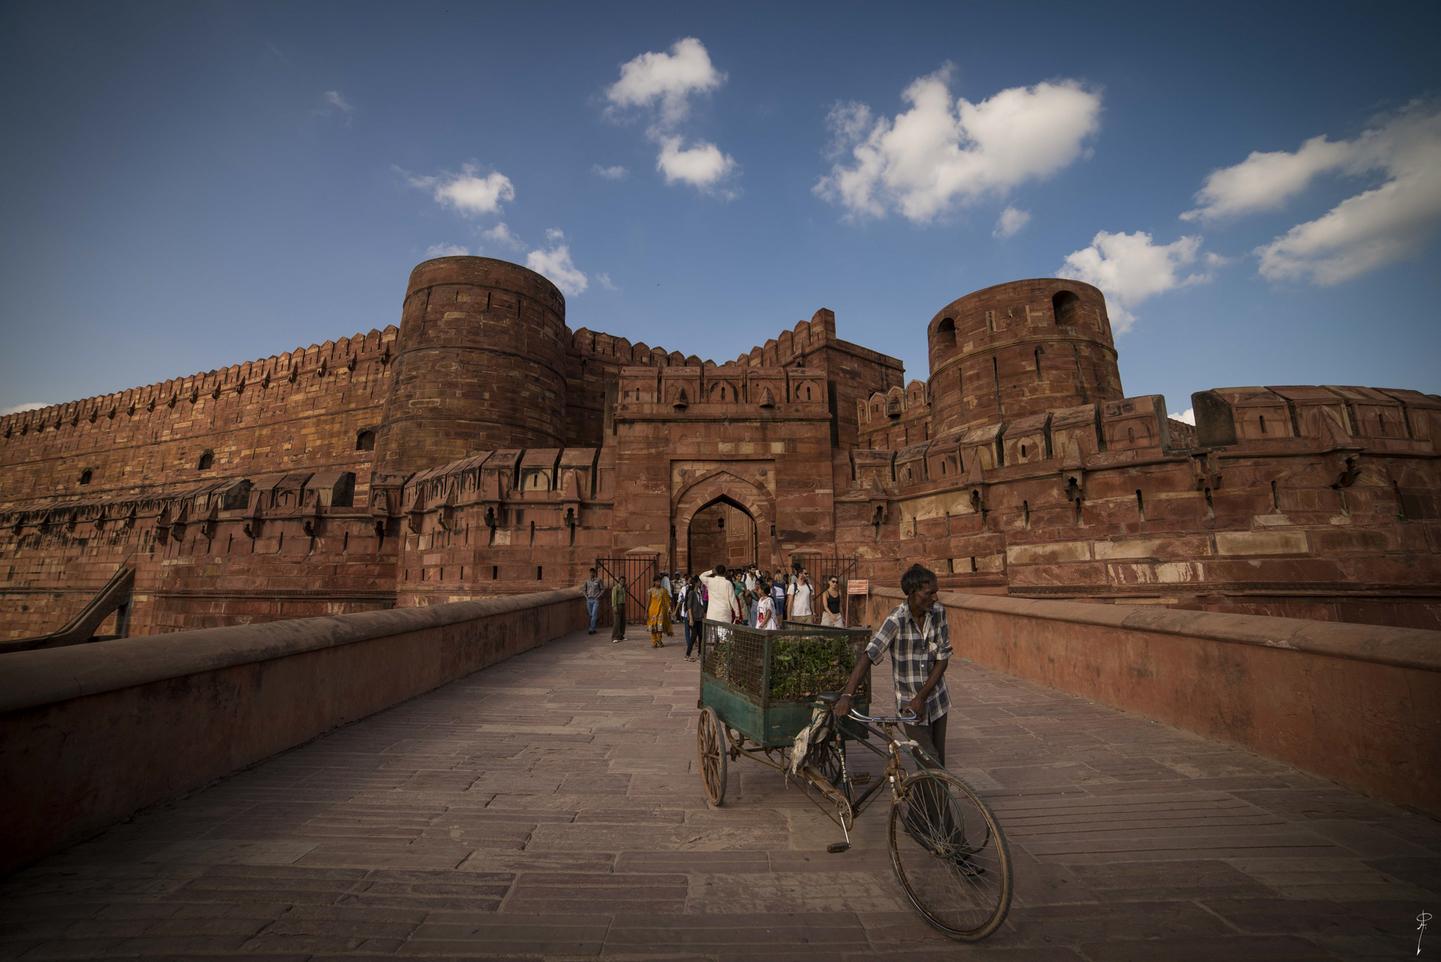 India: Espiritualidad y leyenda